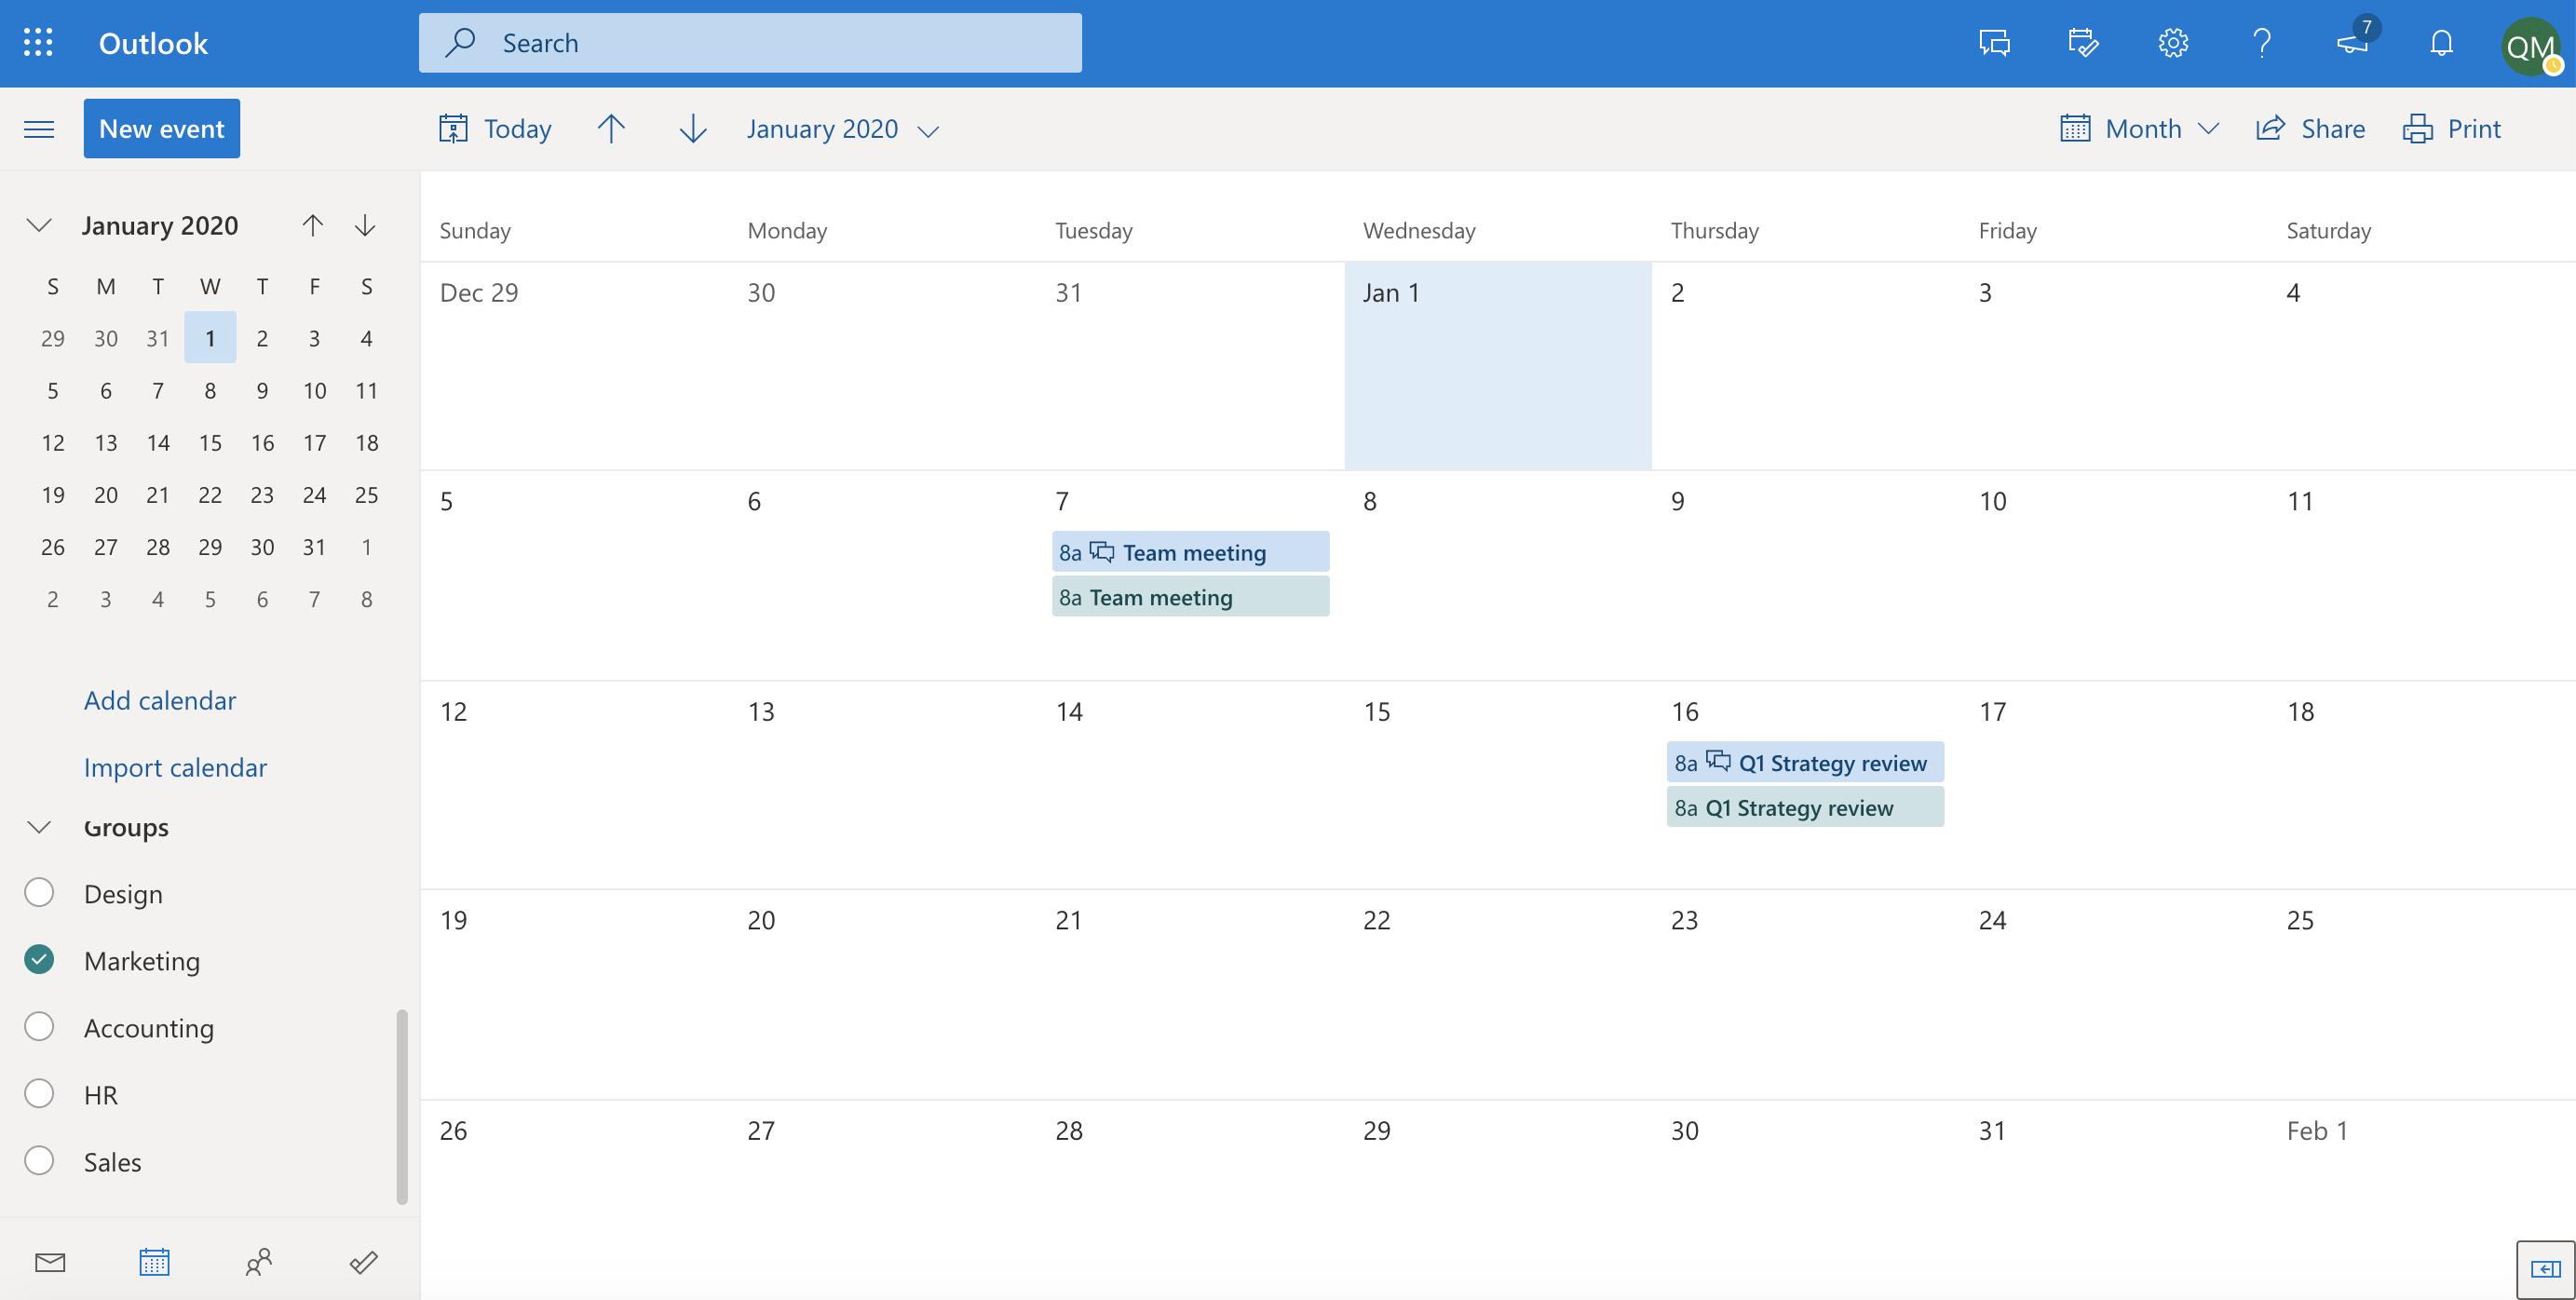 Outlook group calendar